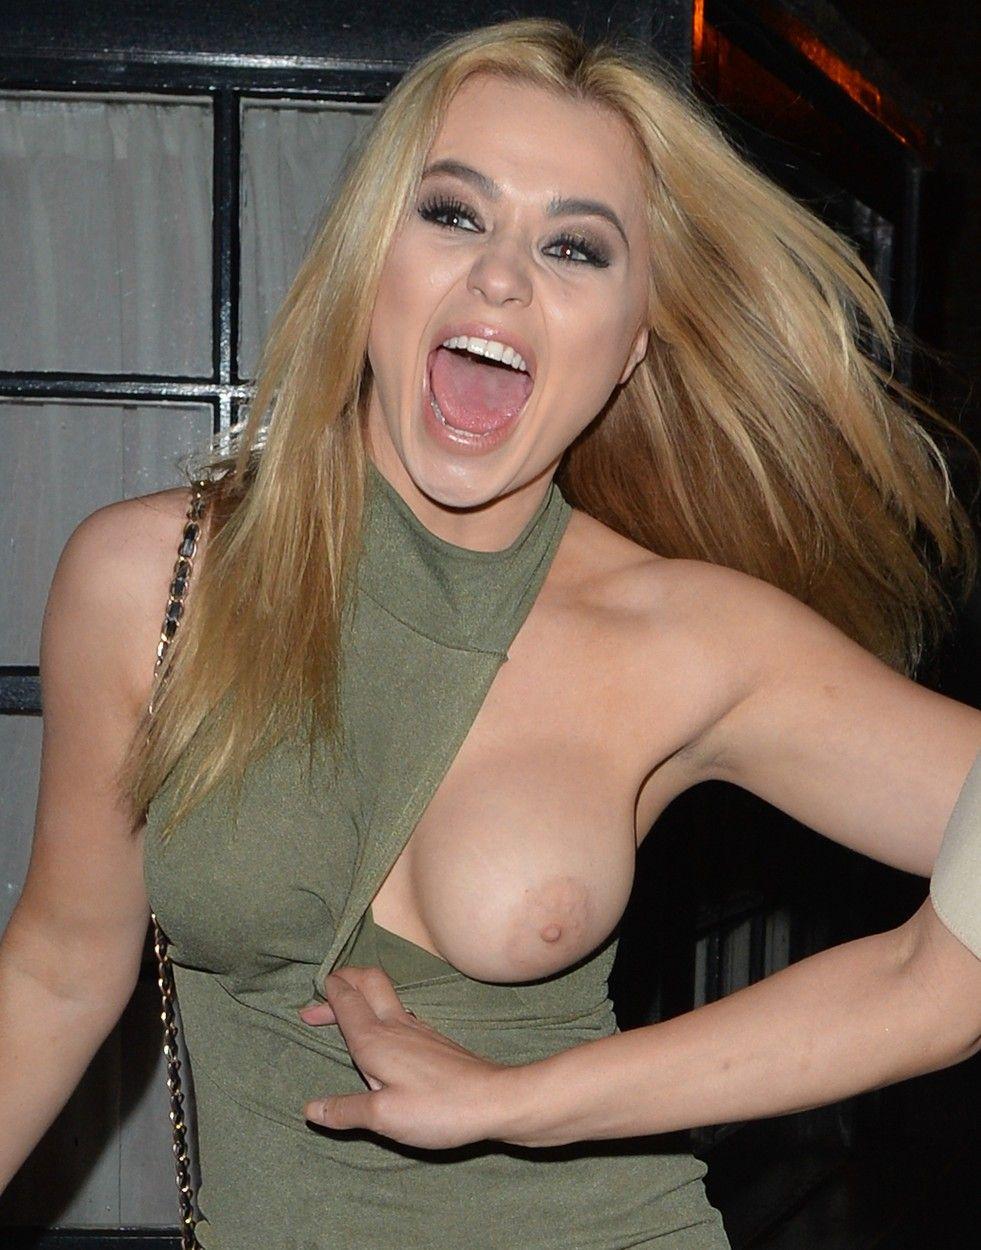 naked Melissa nude reeves